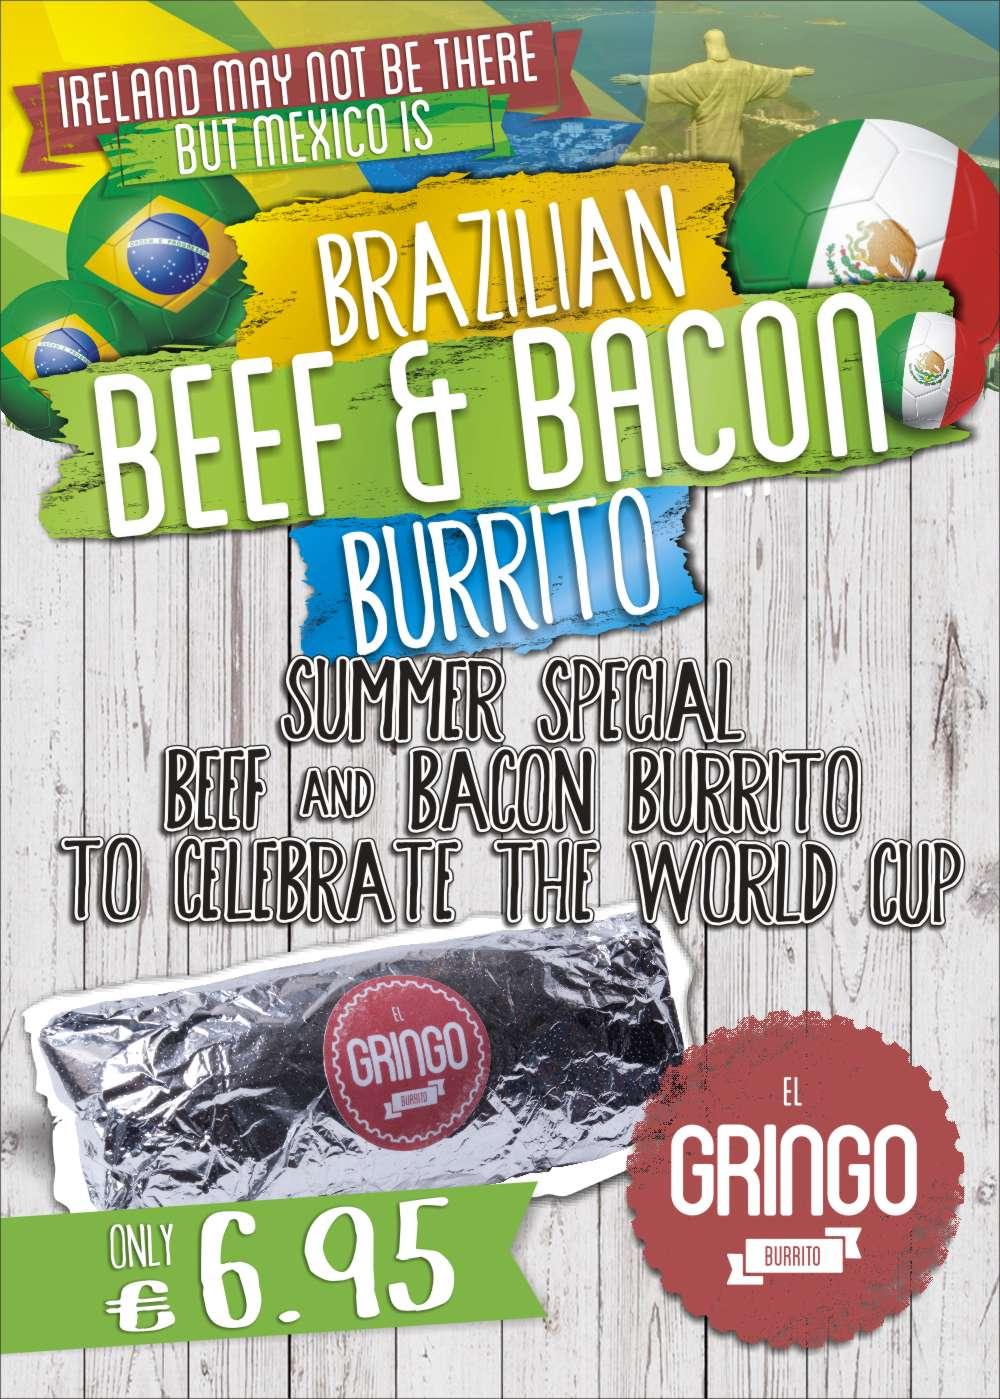 Brazilian Beef & Bacon Special